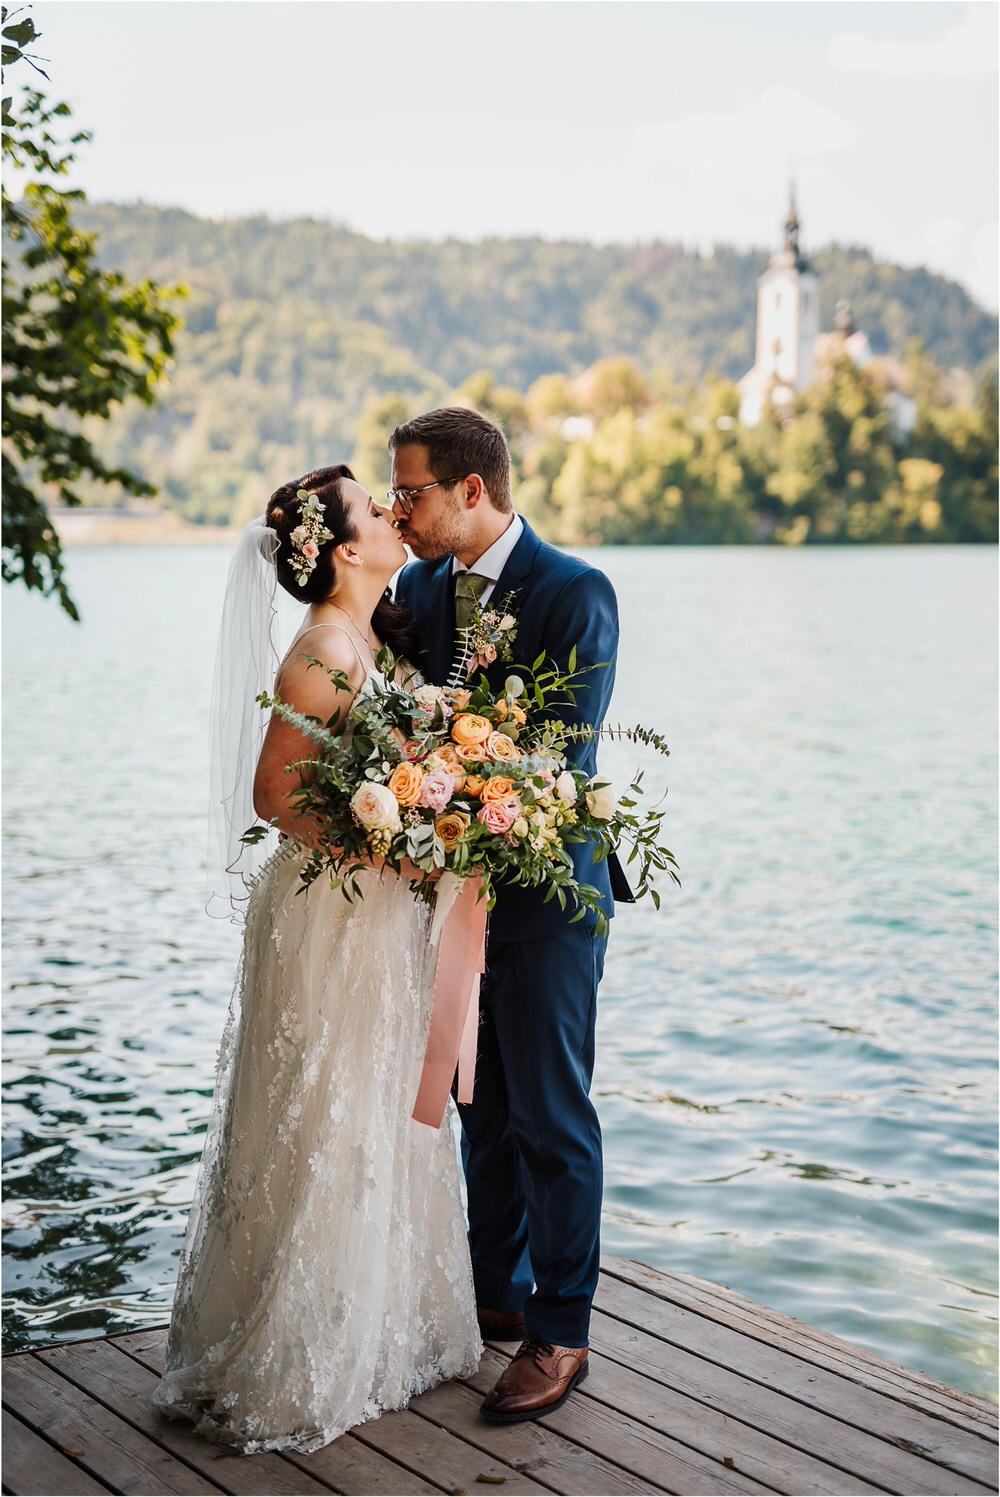 lake bled slovenia wedding vila bled sanjski sopek bled castle ceremony outdoor romantic wedding photographer photography natural candid bright 0073.jpg